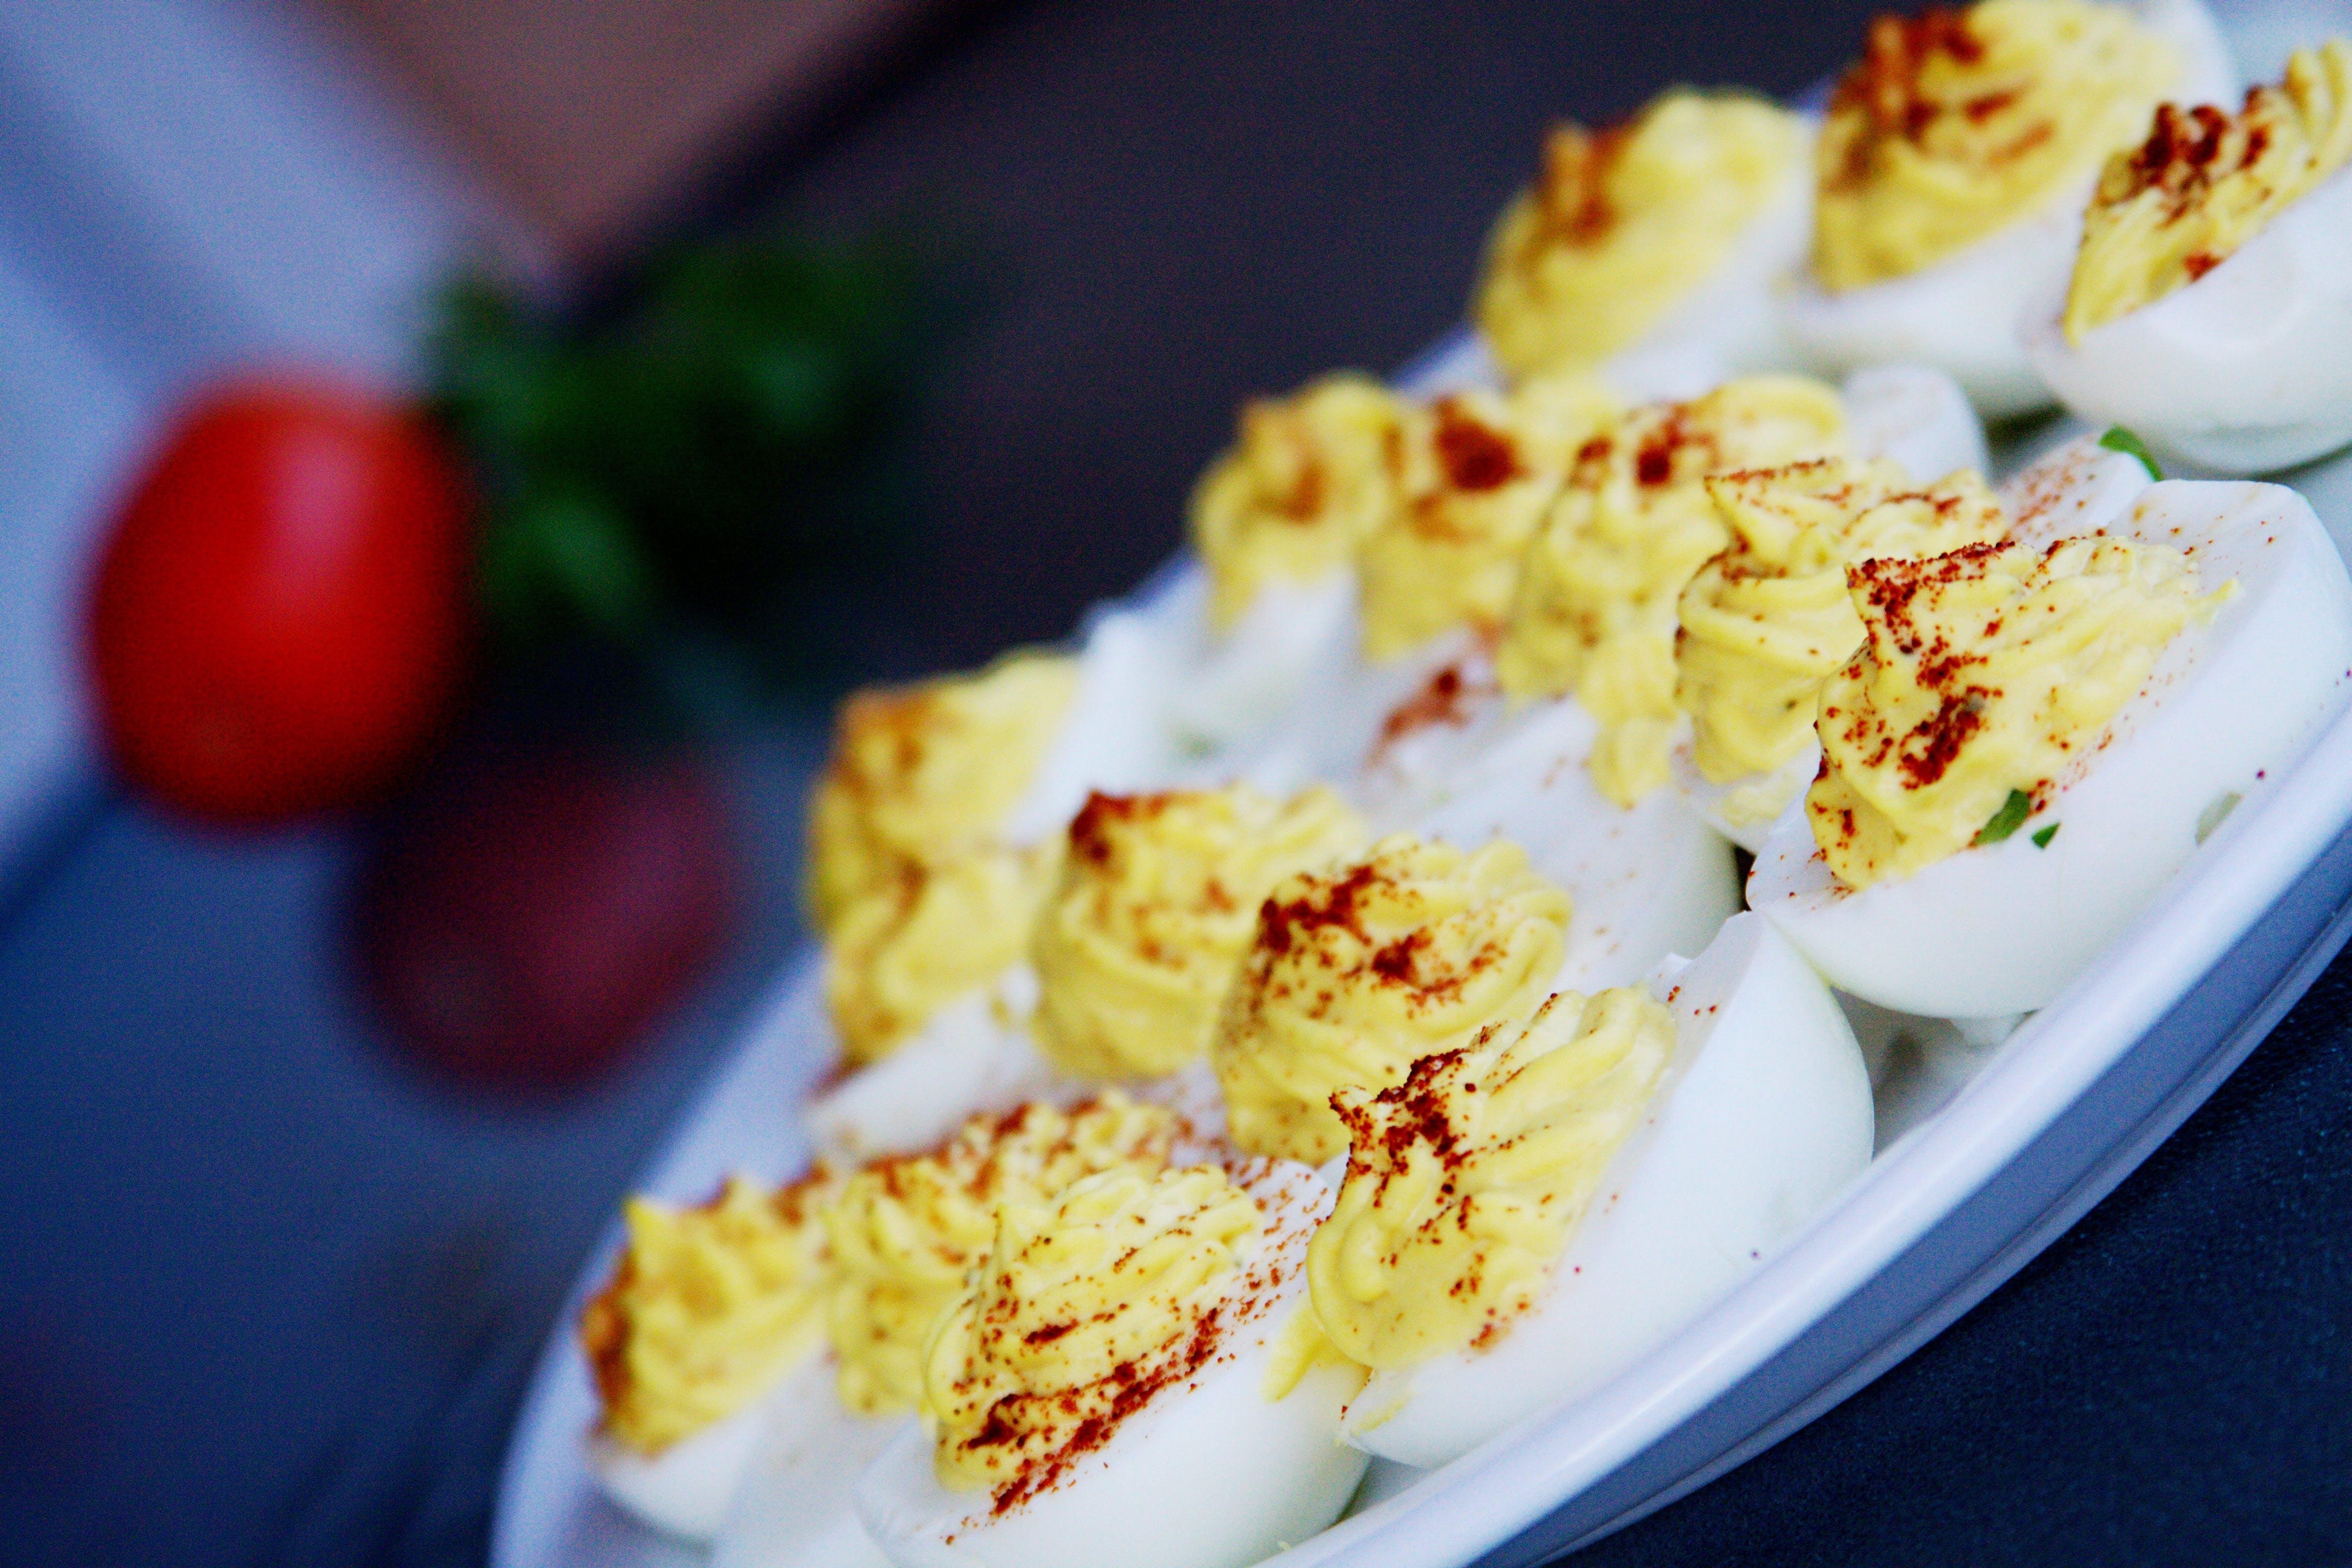 Dish on White Cerami Plate